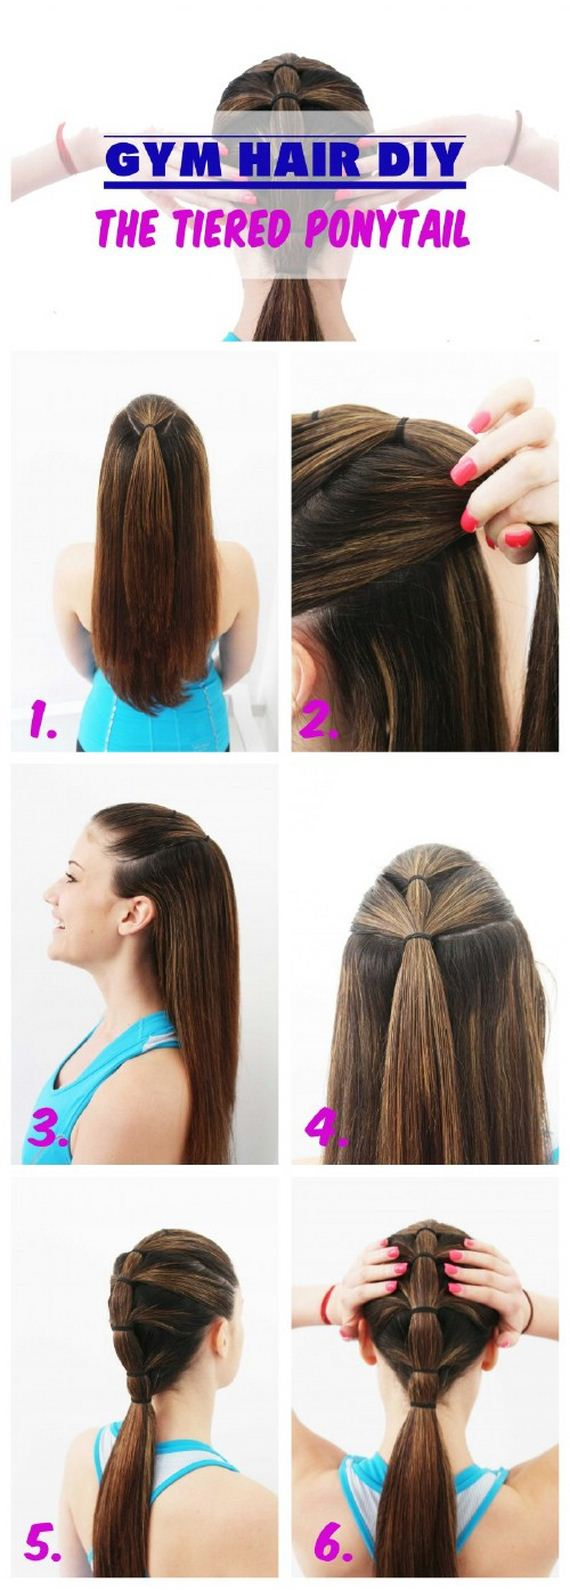 12-double-ponytail